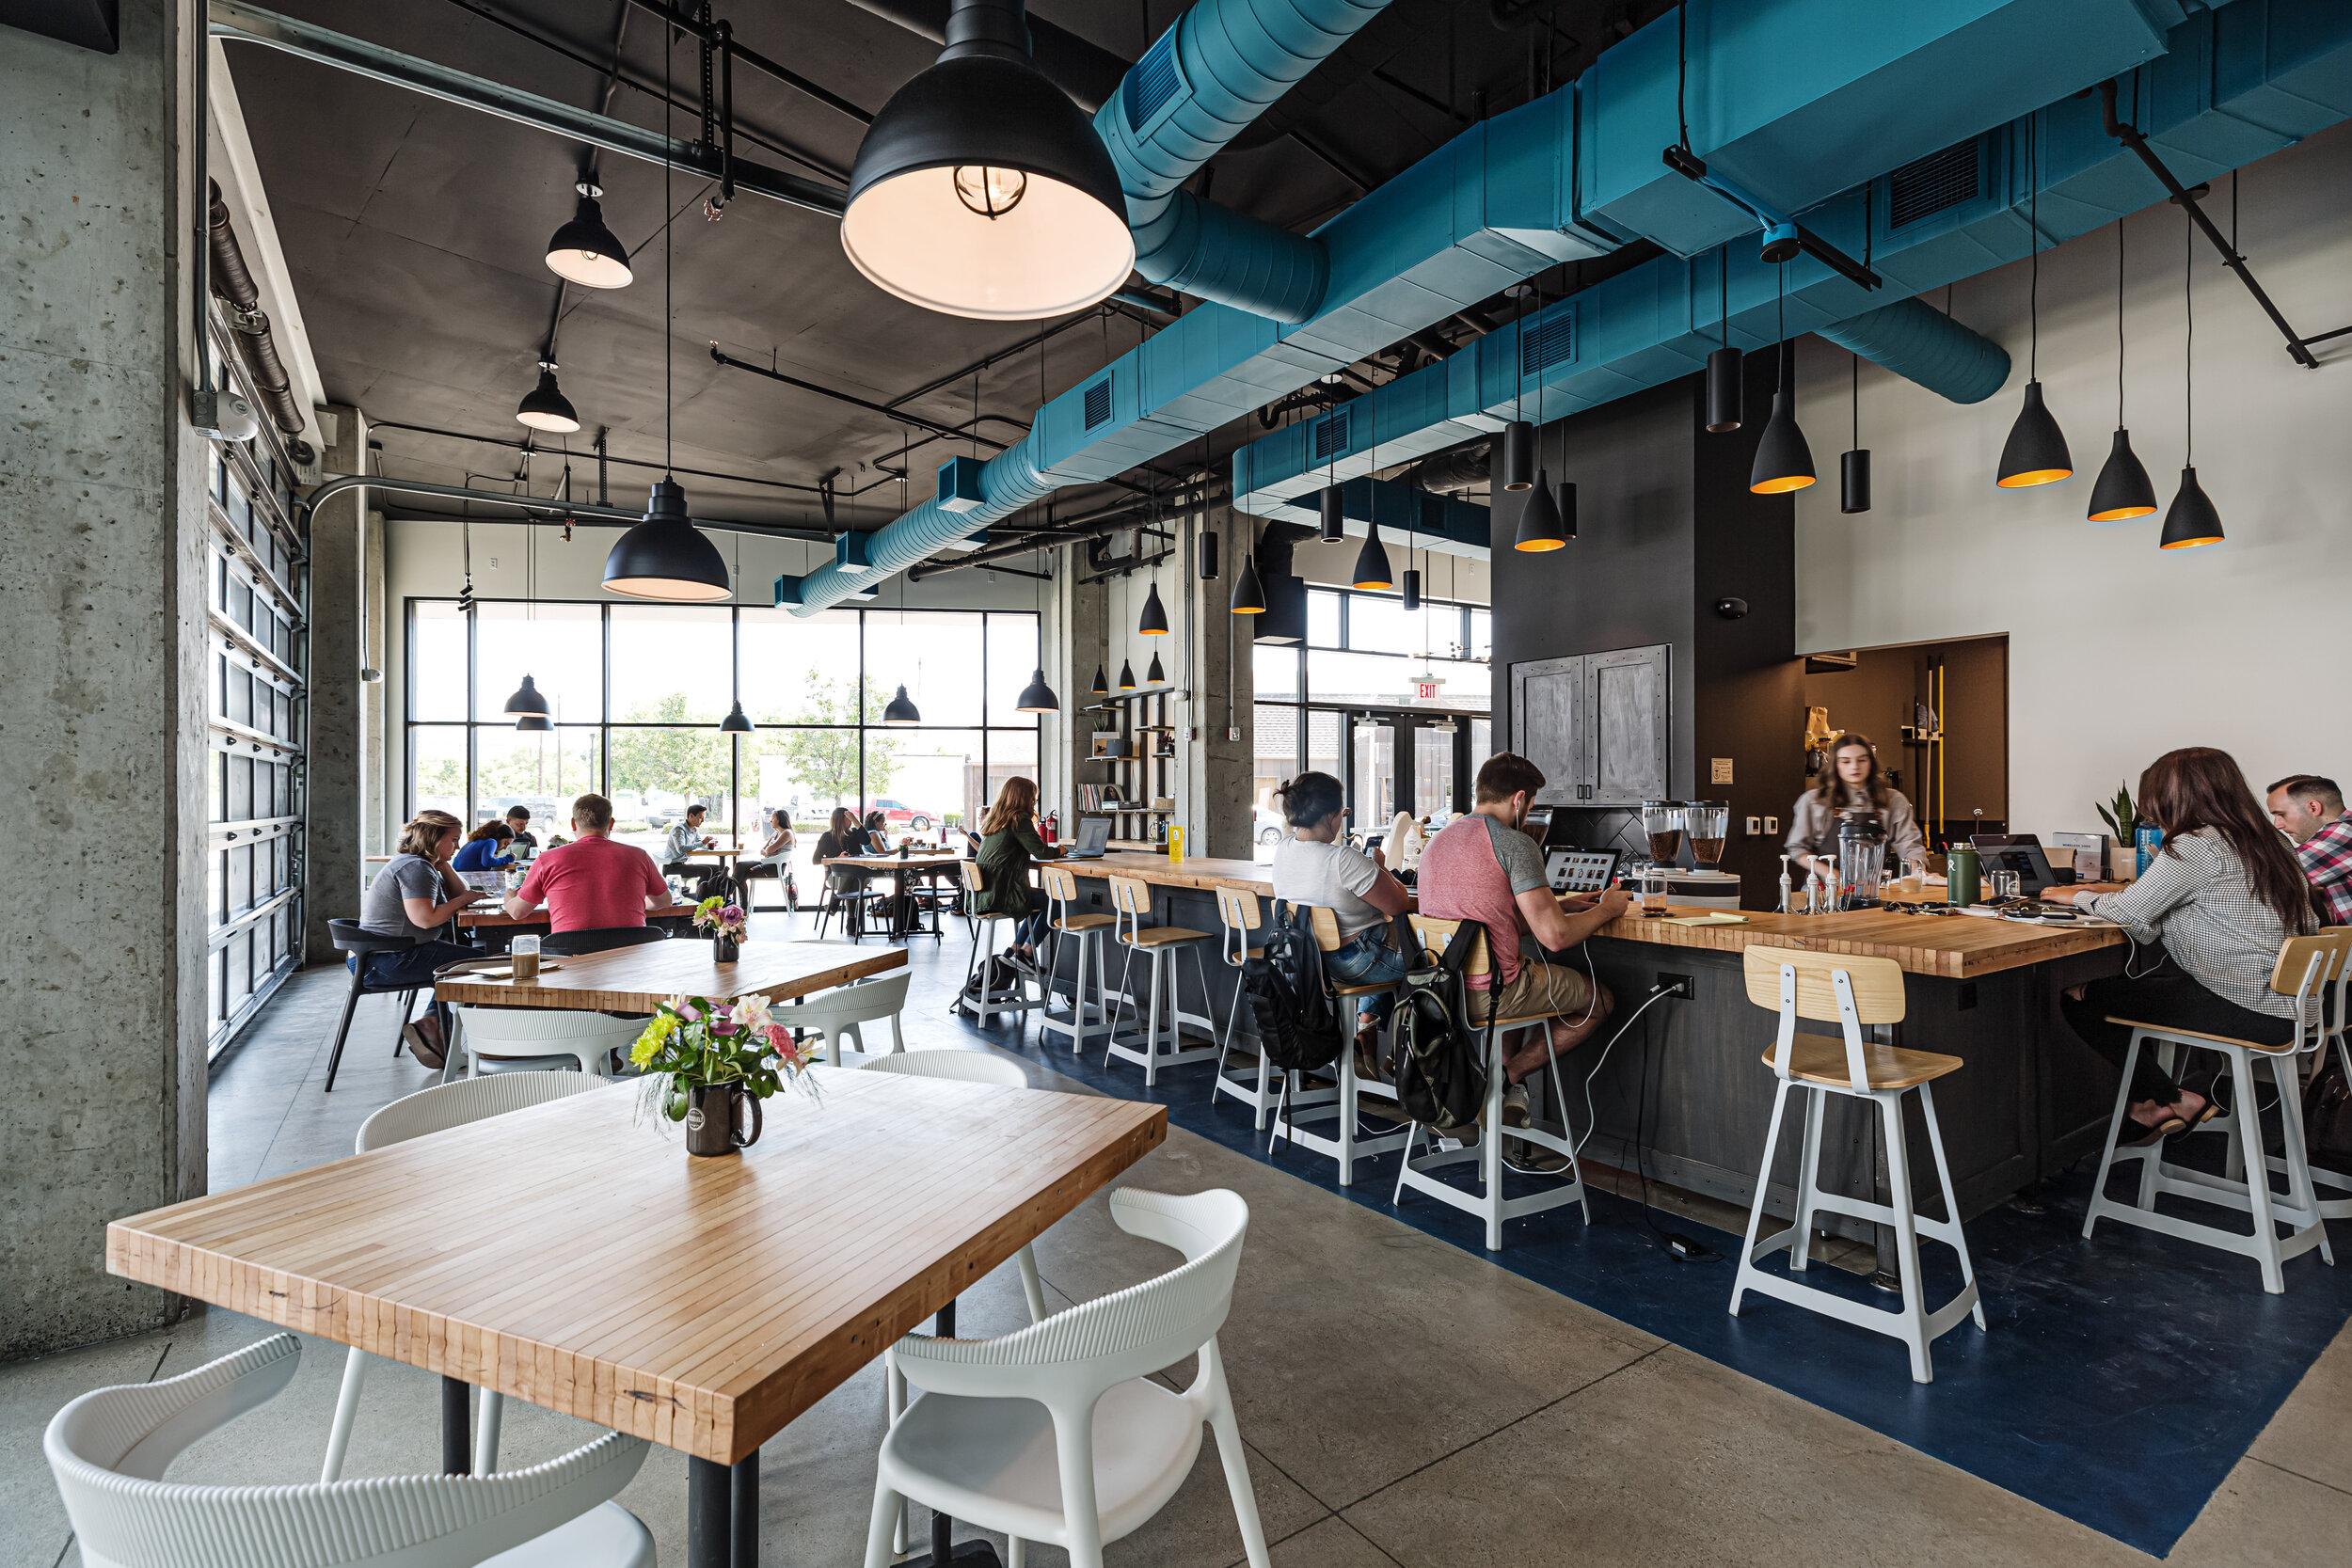 TRIAD Architects_Roosevelt Coffee_Interior Photographic Image_Seating Area 05.jpg